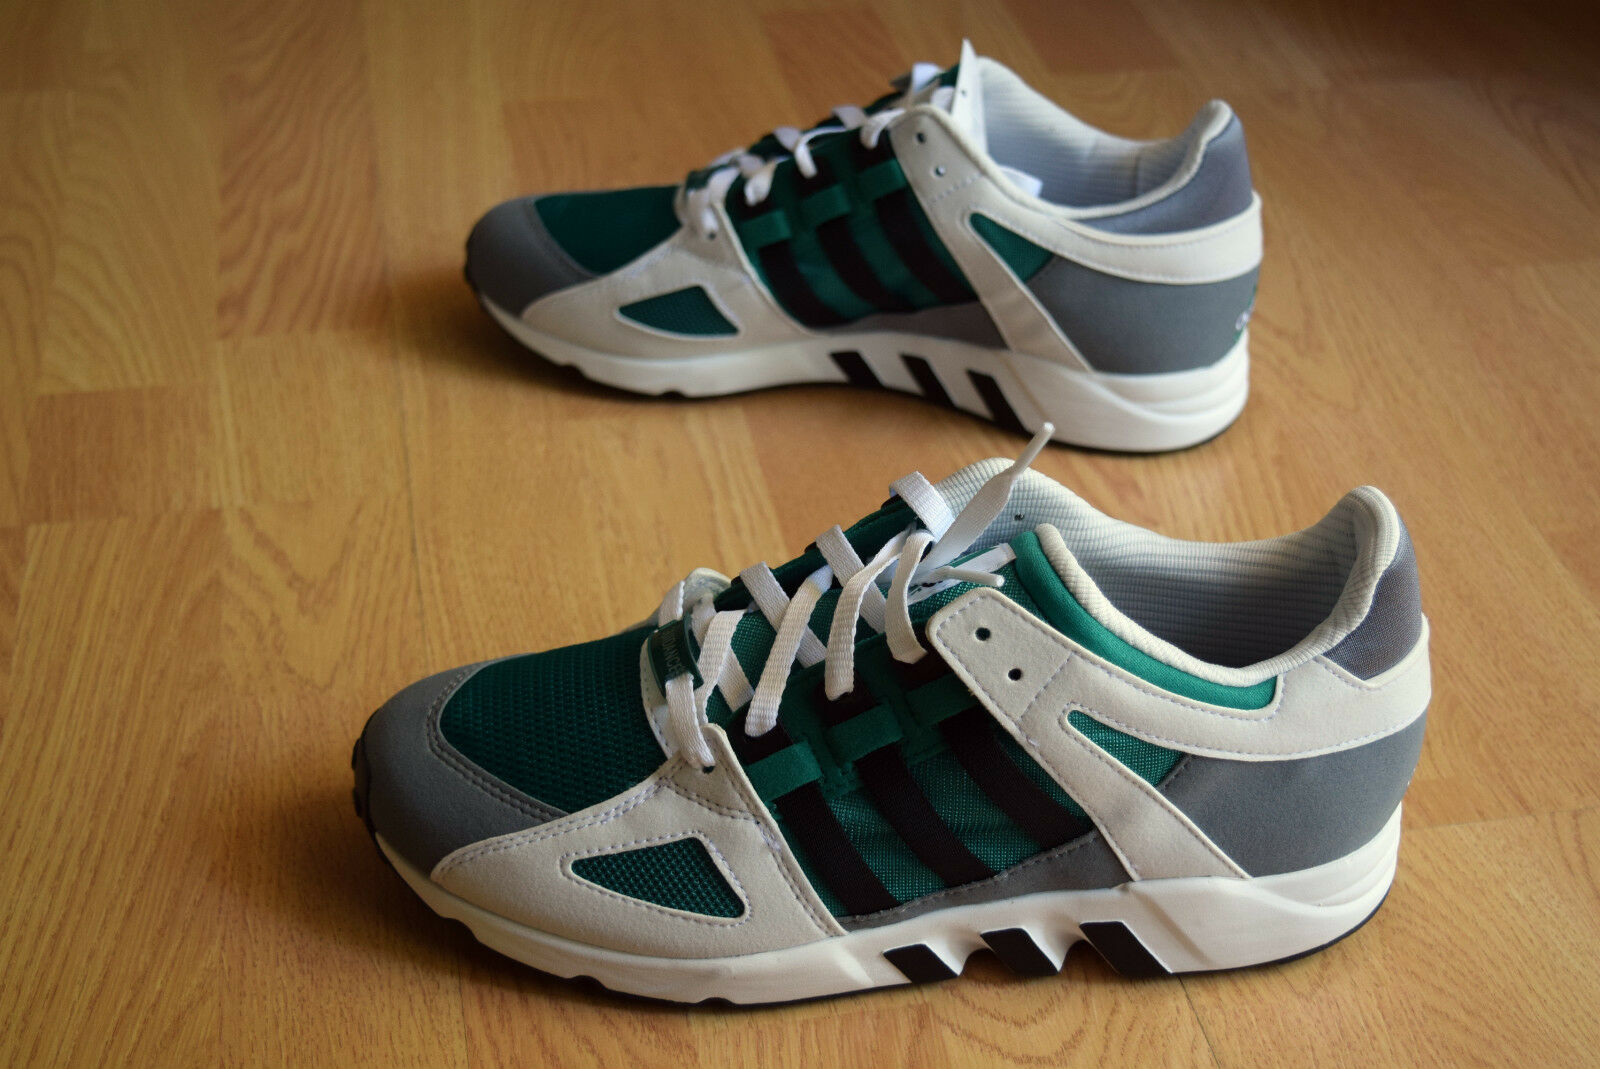 Adidas Equipment Guidance Running 38,5 40,5 45 46 47 48 49 B40931 Support 93